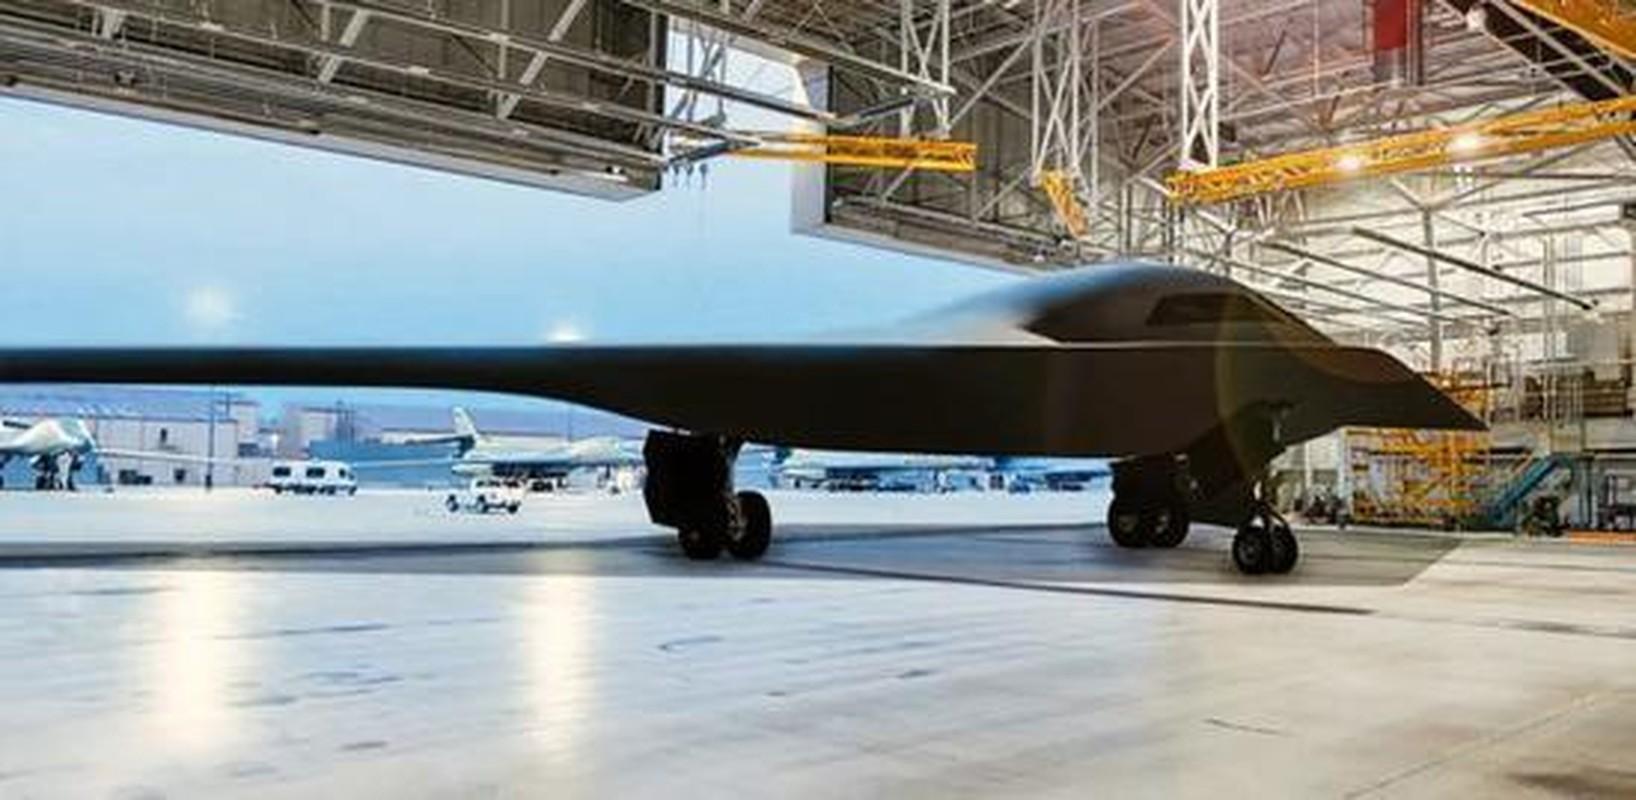 UAV tang hinh bi an cua My khien Trung Quoc run so tot do-Hinh-15